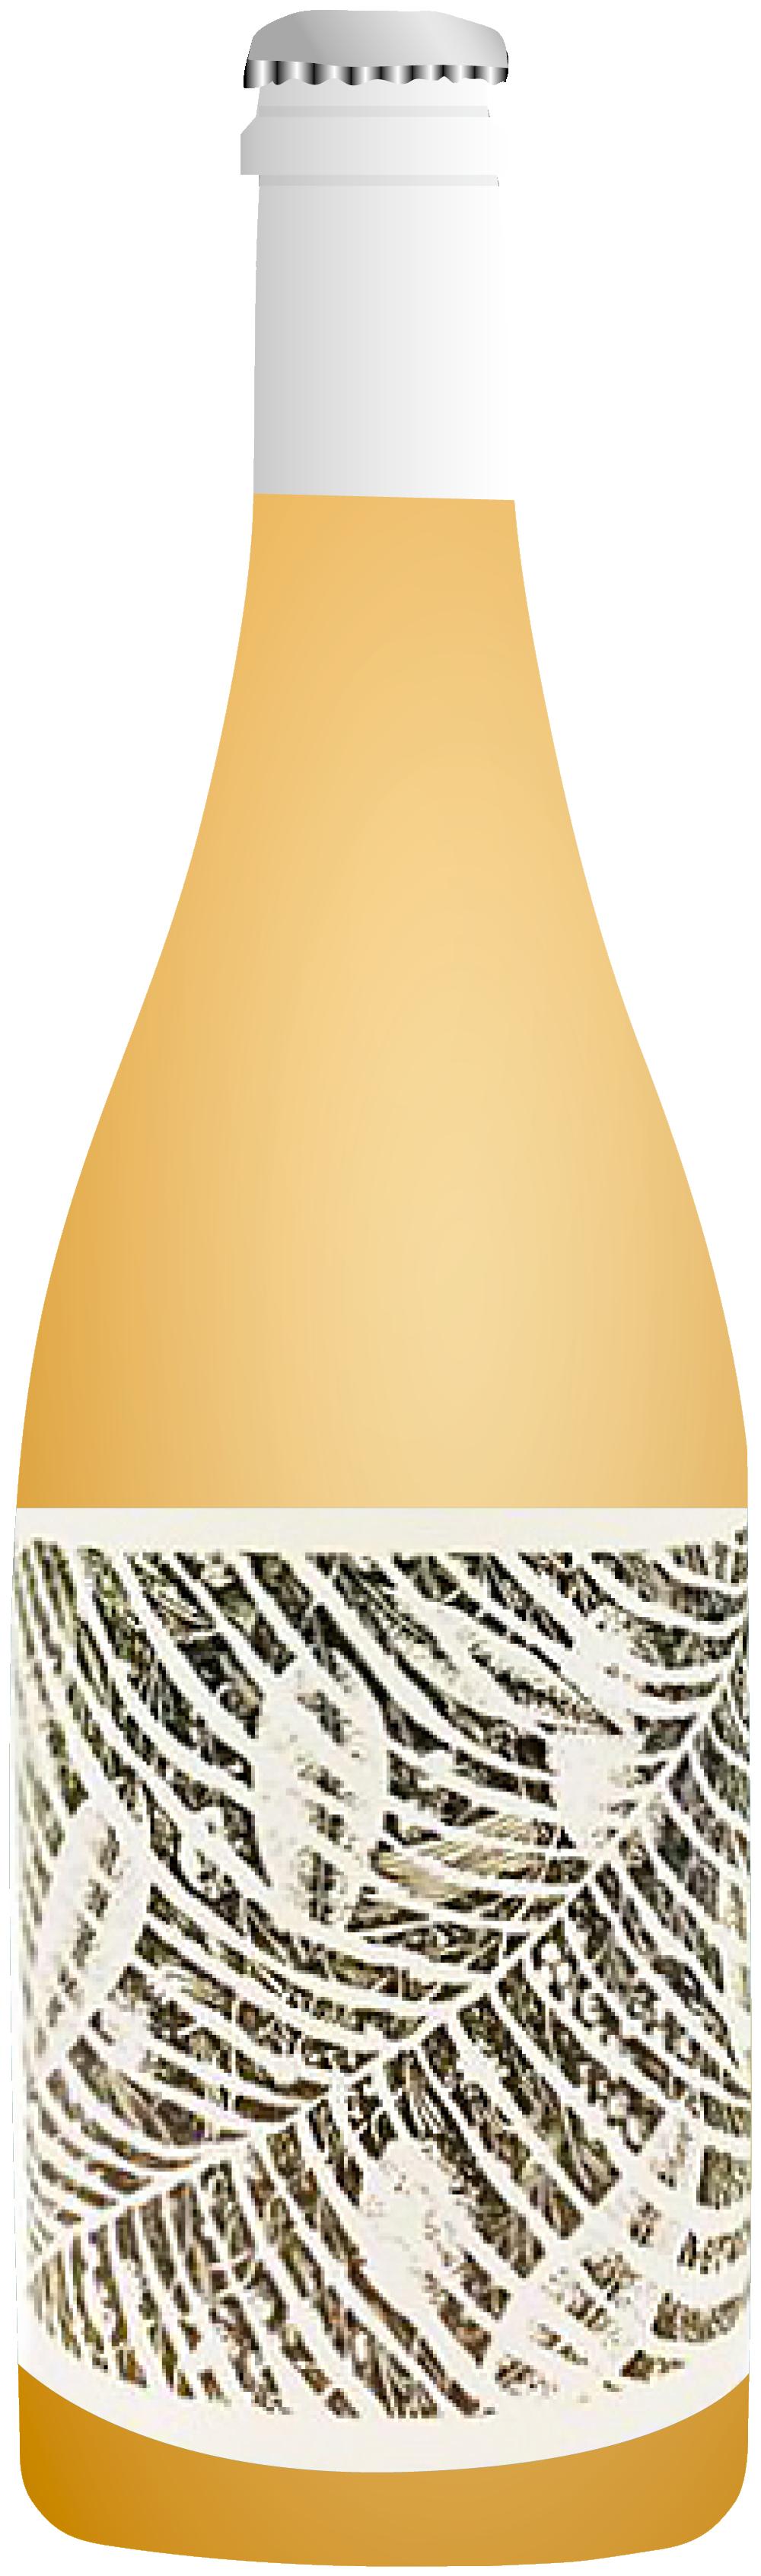 tnwc_bottles_20214